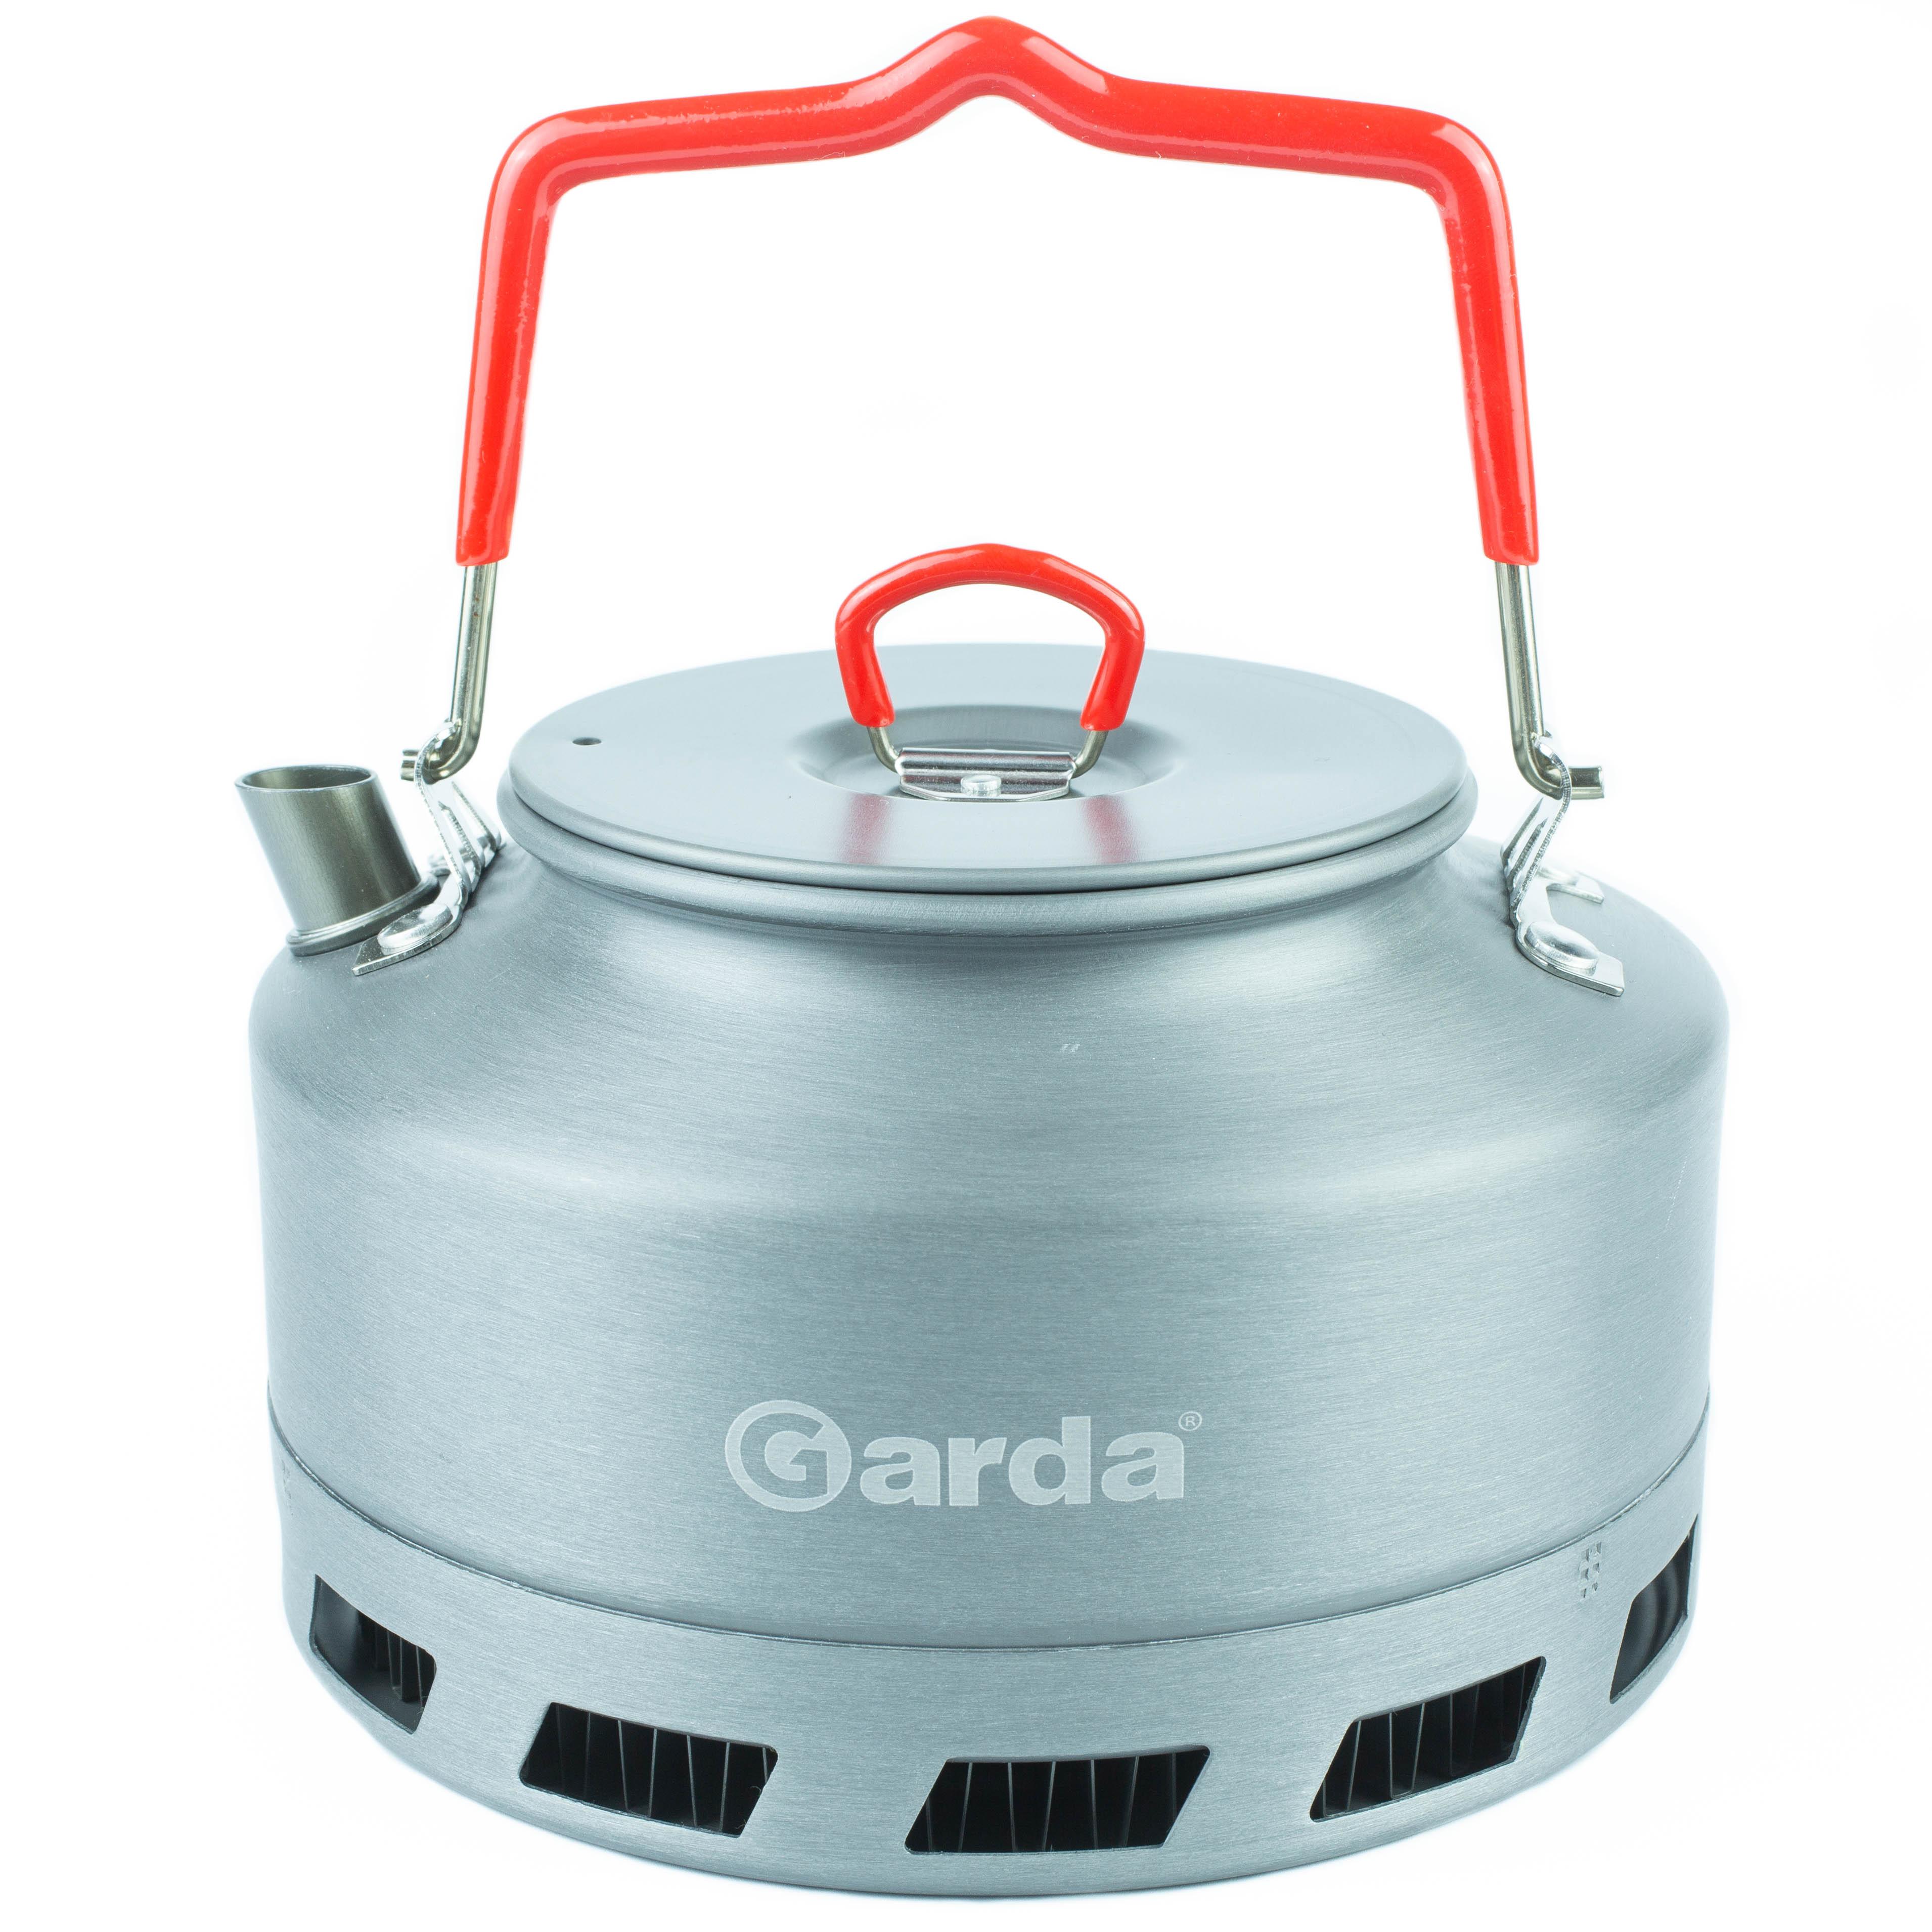 Garda camping - Konvice Master Fast Heat Kettle 1,1l